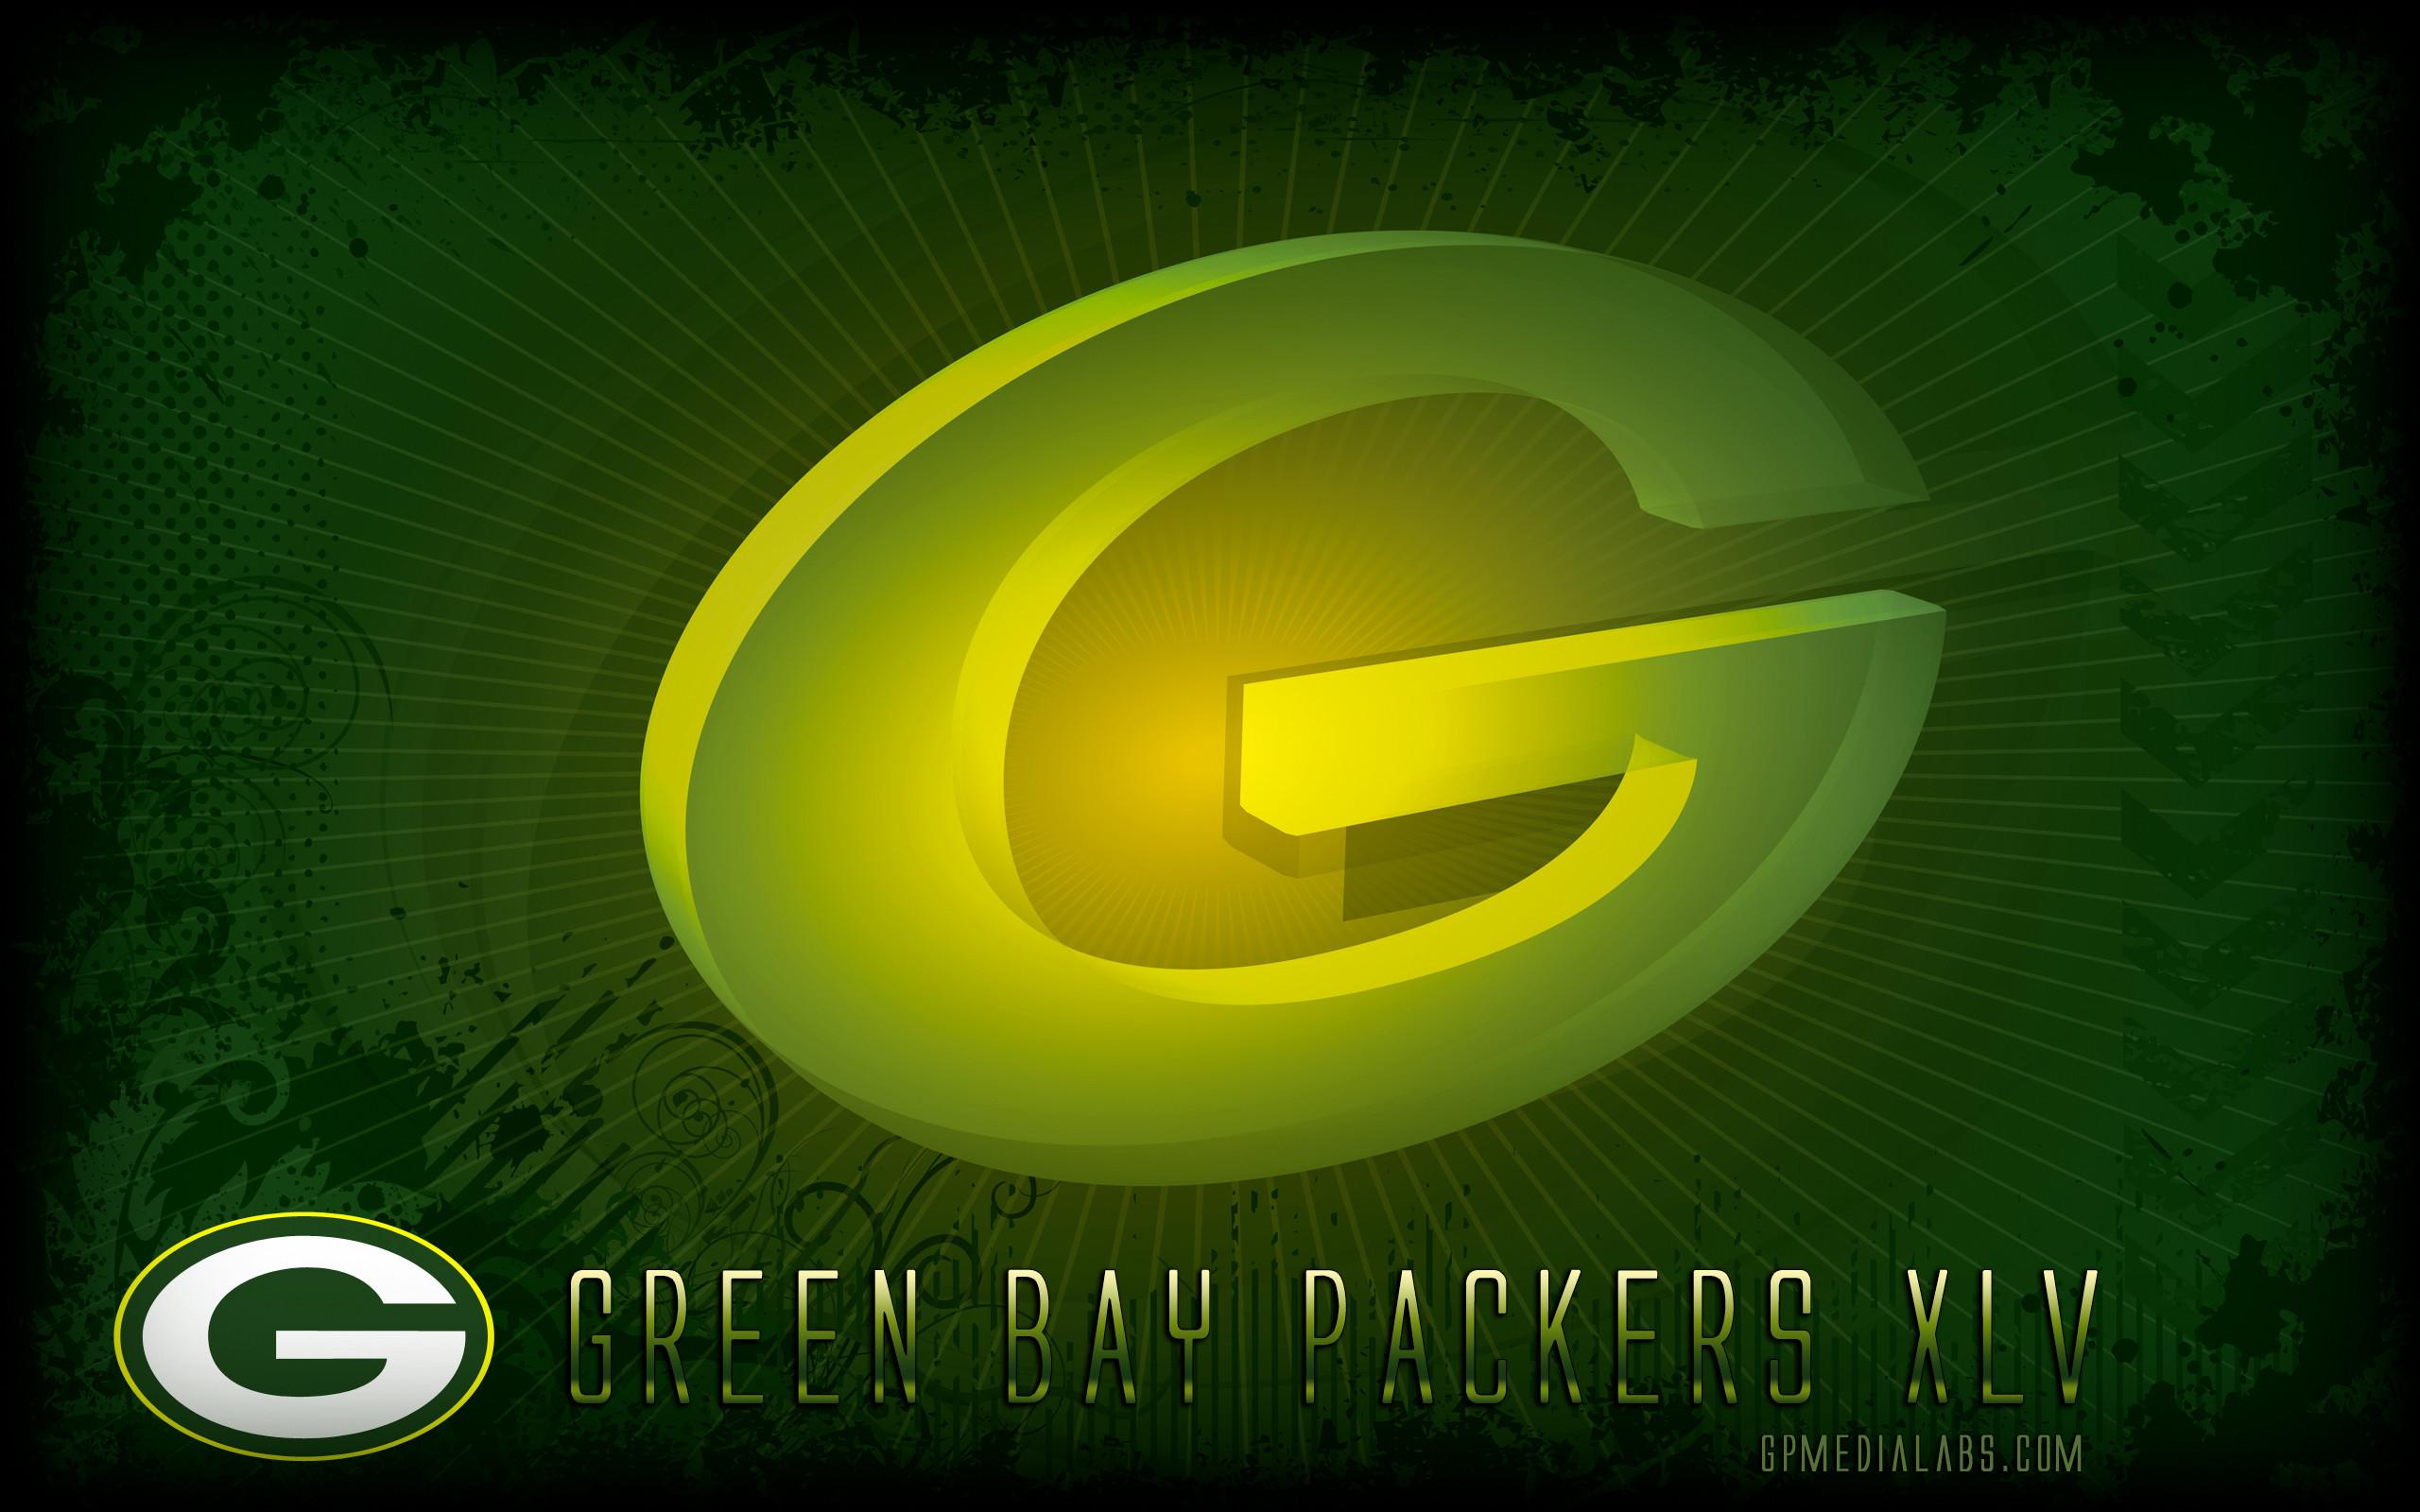 Download wallpaper: 1440 x 900 • 1920×1200 • 2560 x 1600. Green Bay Packers  Wallpaper …